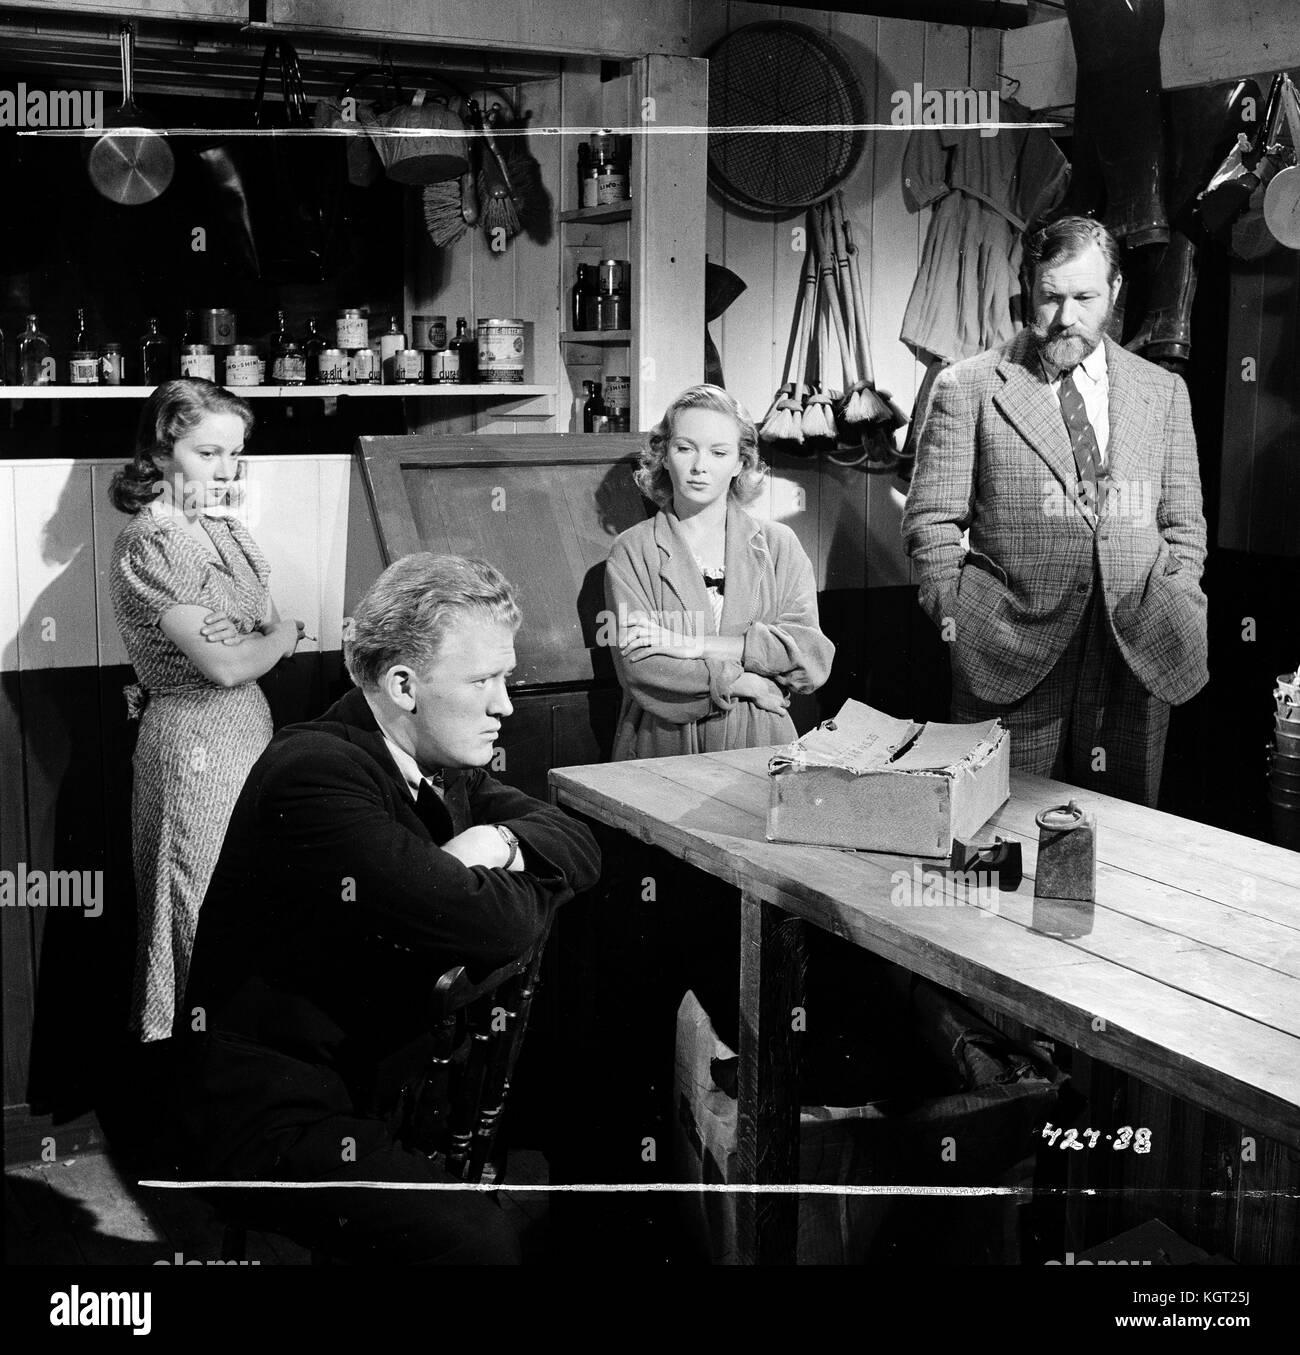 Whisky Galore (1949), Gordon Jackson, James Robertson Justice, Joan Greenwood, Gabrielle Blunt - Stock Image